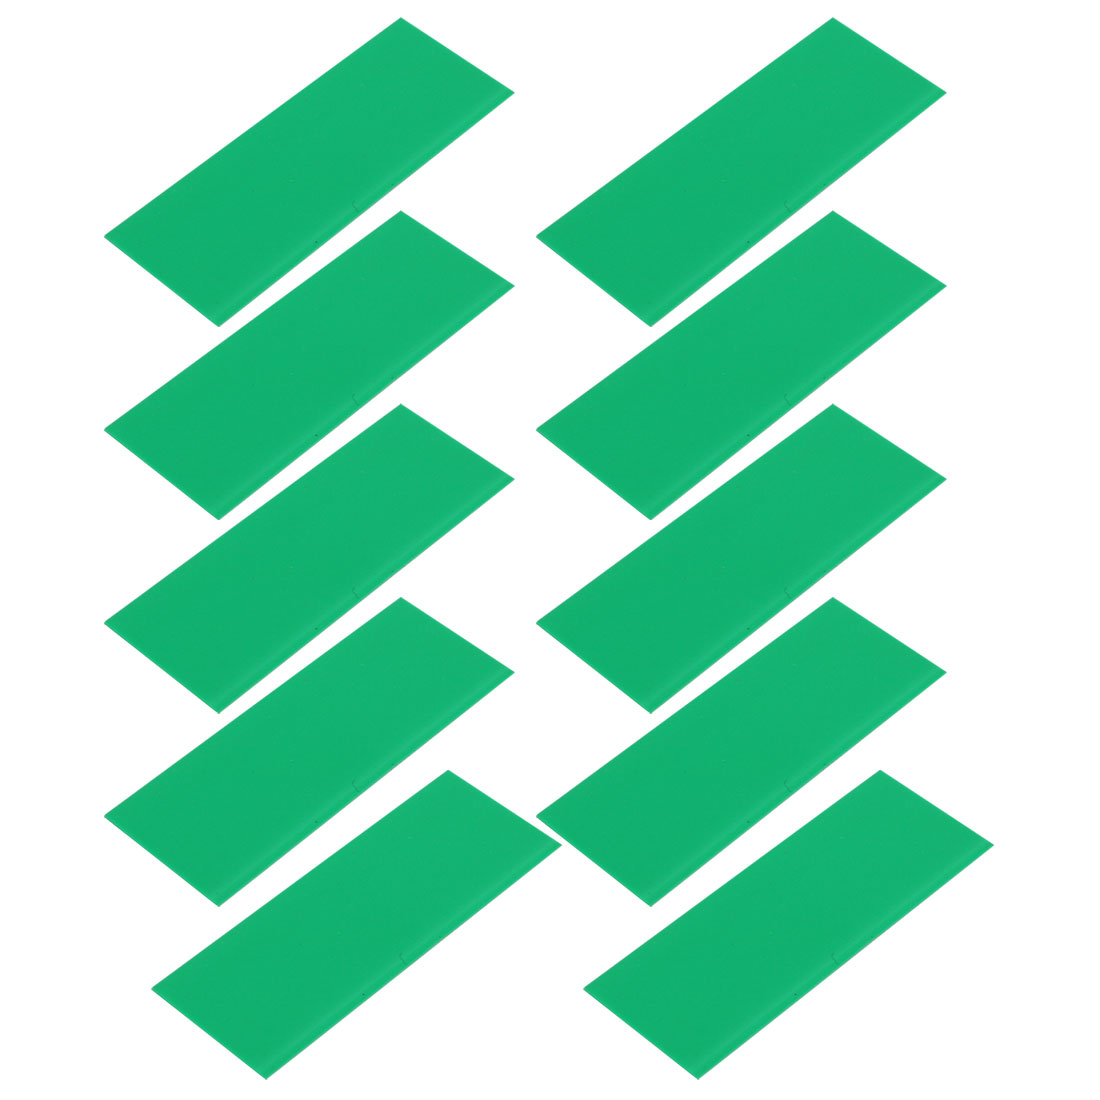 10pcs 17mm Flat Width 46mm Length PVC Heat Shrinkable Tube Green for AAA Battery